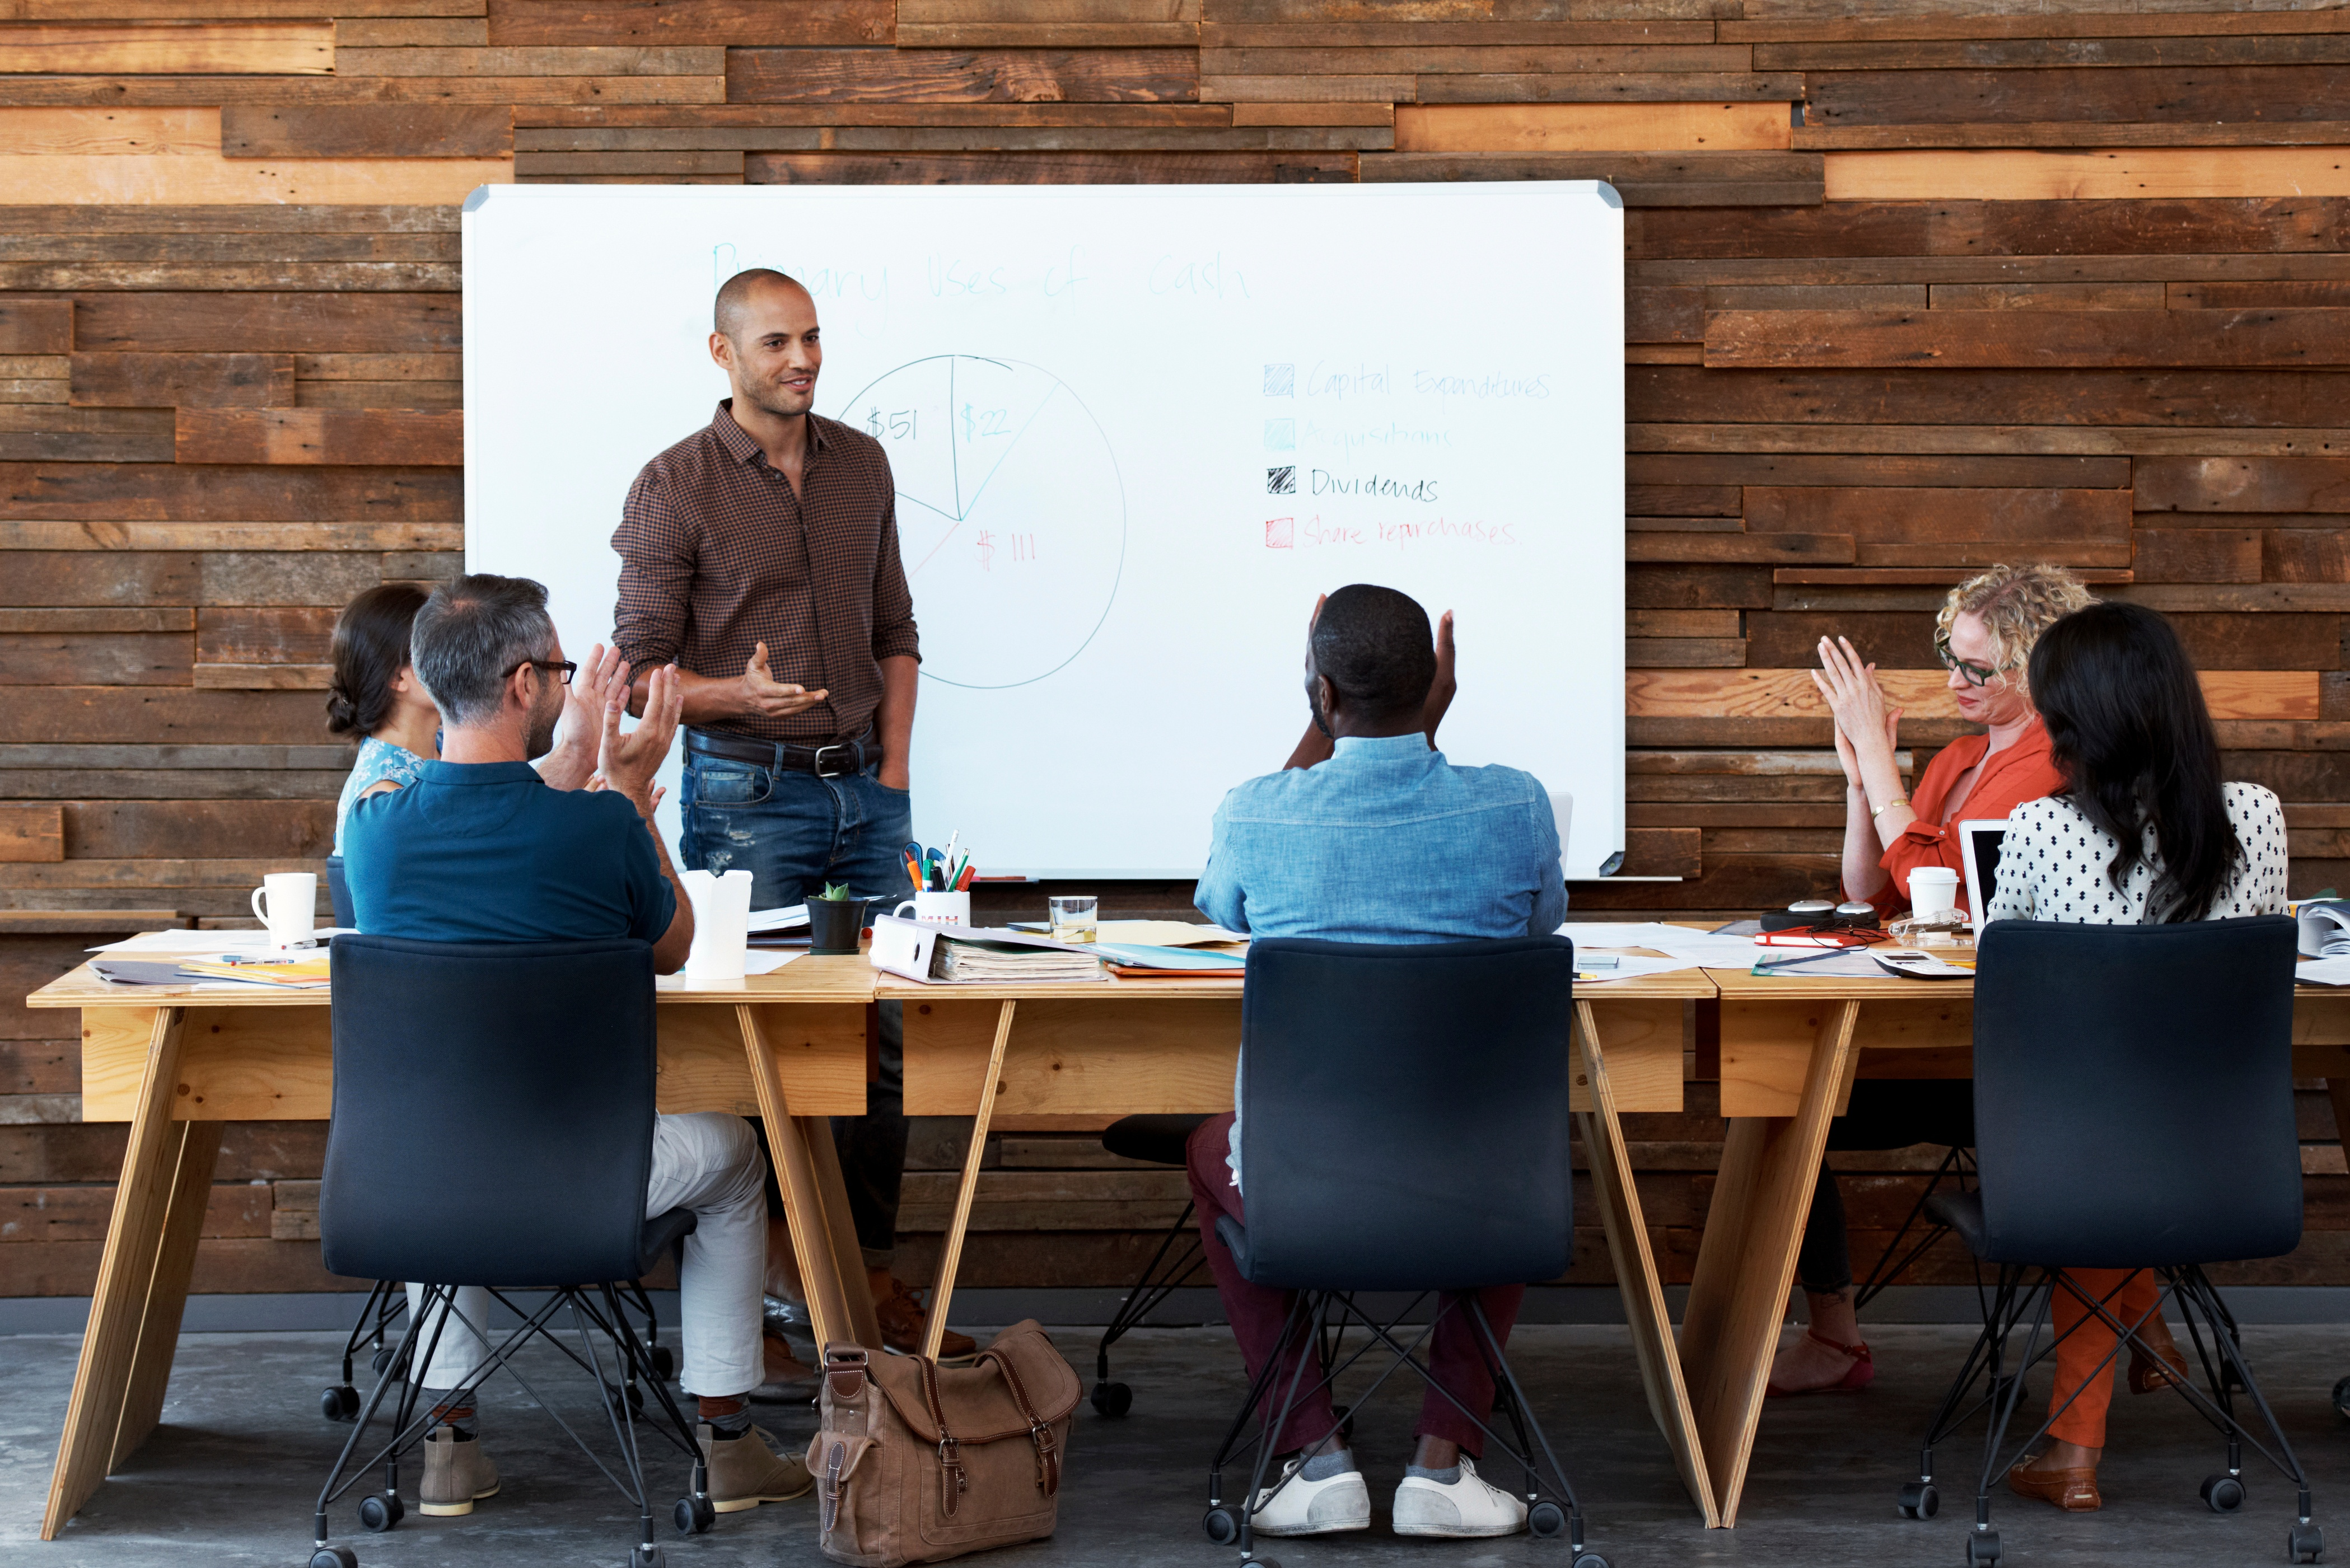 Promote professional development